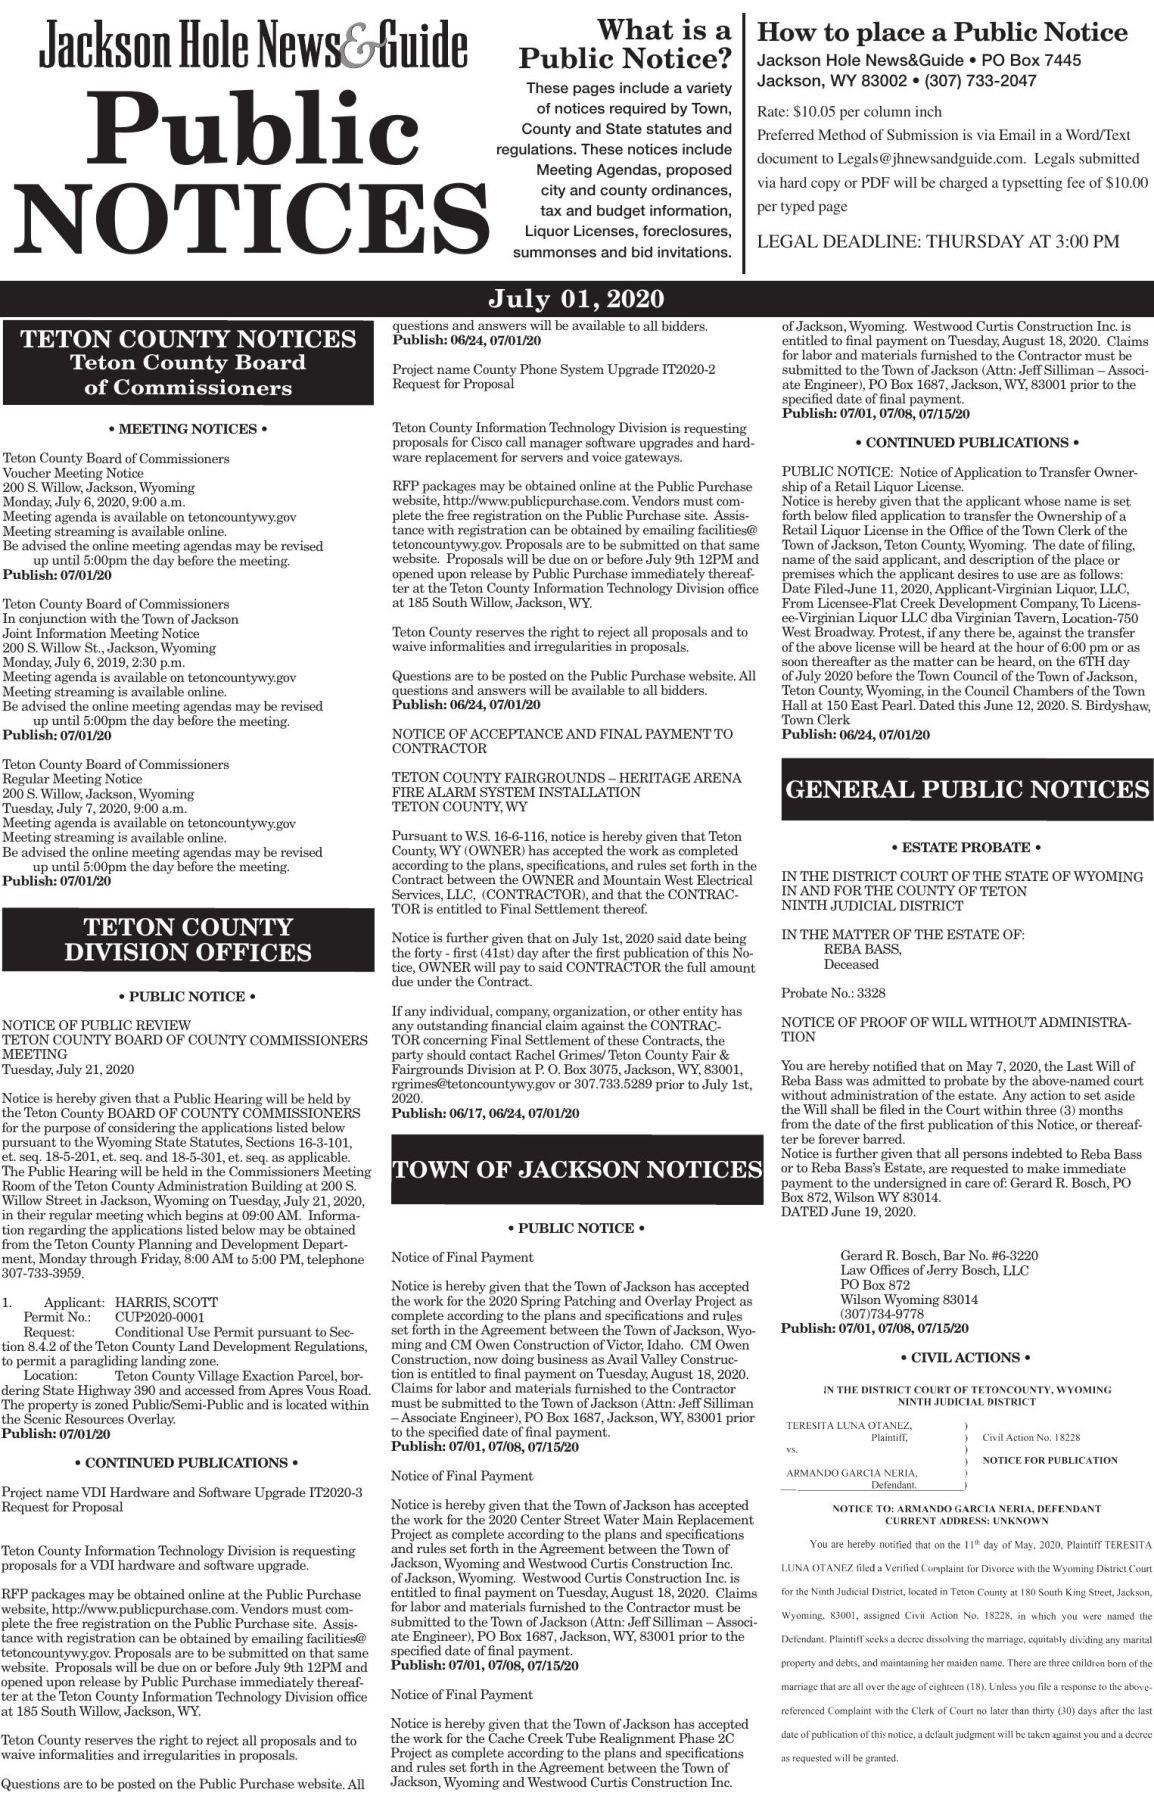 Public Notices, July 01, 2020